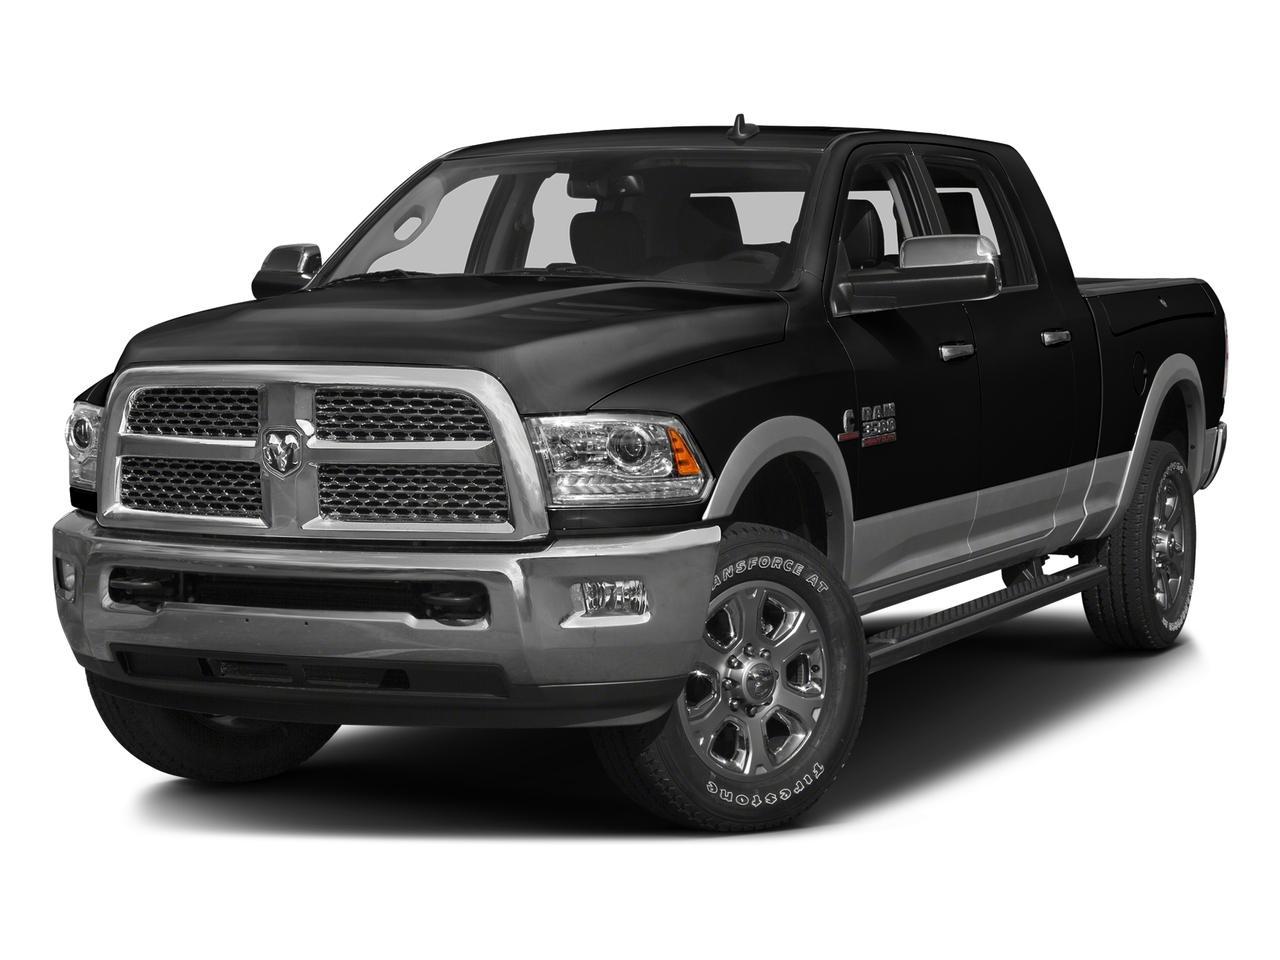 2016 Ram 3500 Vehicle Photo in San Antonio, TX 78238